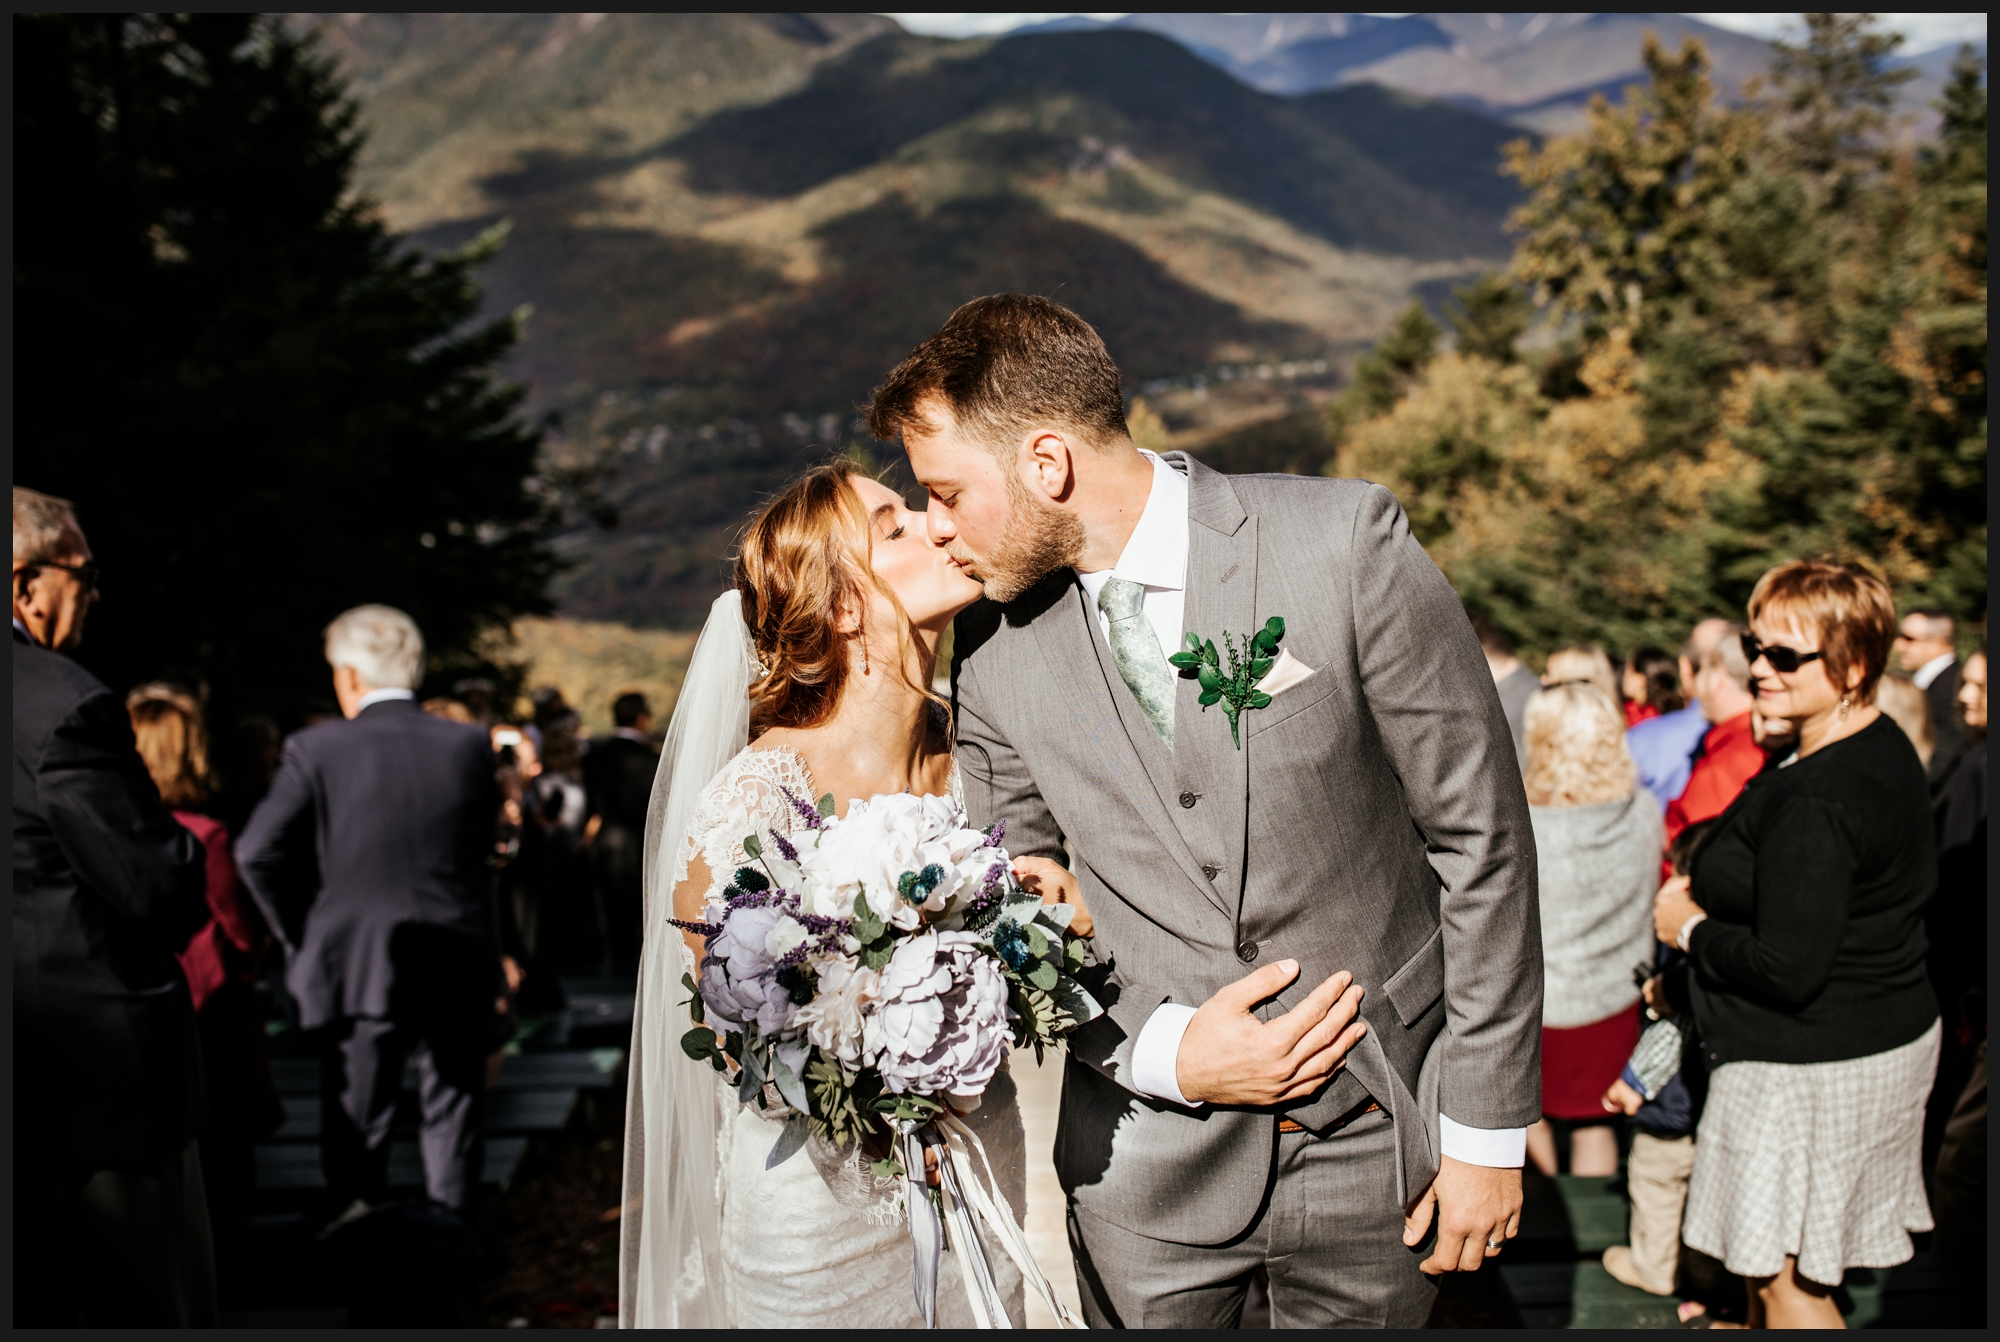 Orlando-Wedding-Photographer-destination-wedding-photographer-florida-wedding-photographer-hawaii-wedding-photographer_0144.jpg